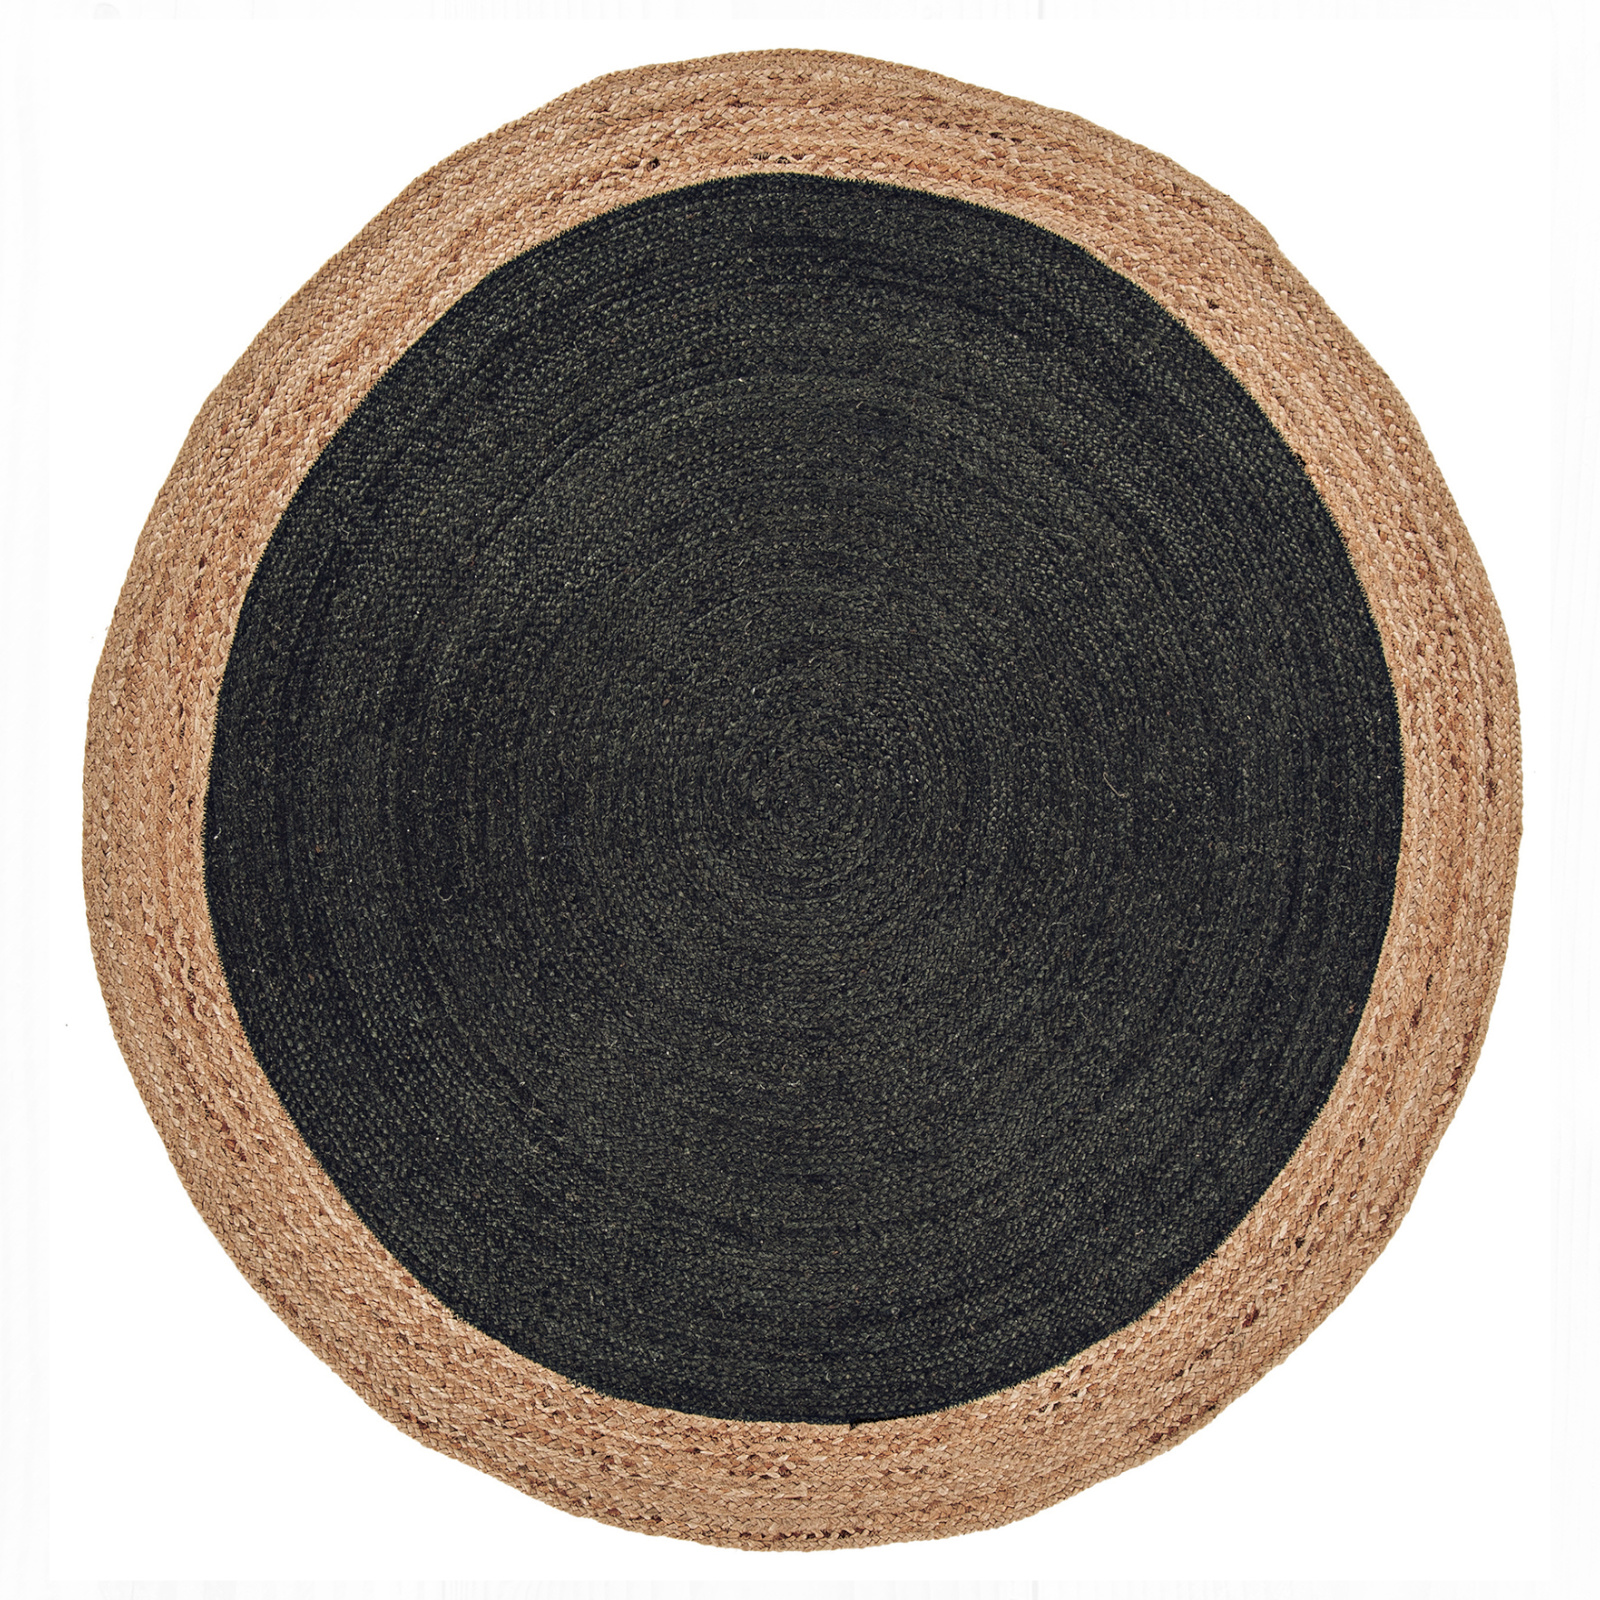 FARO_Charcoal-1-rugs.jpg